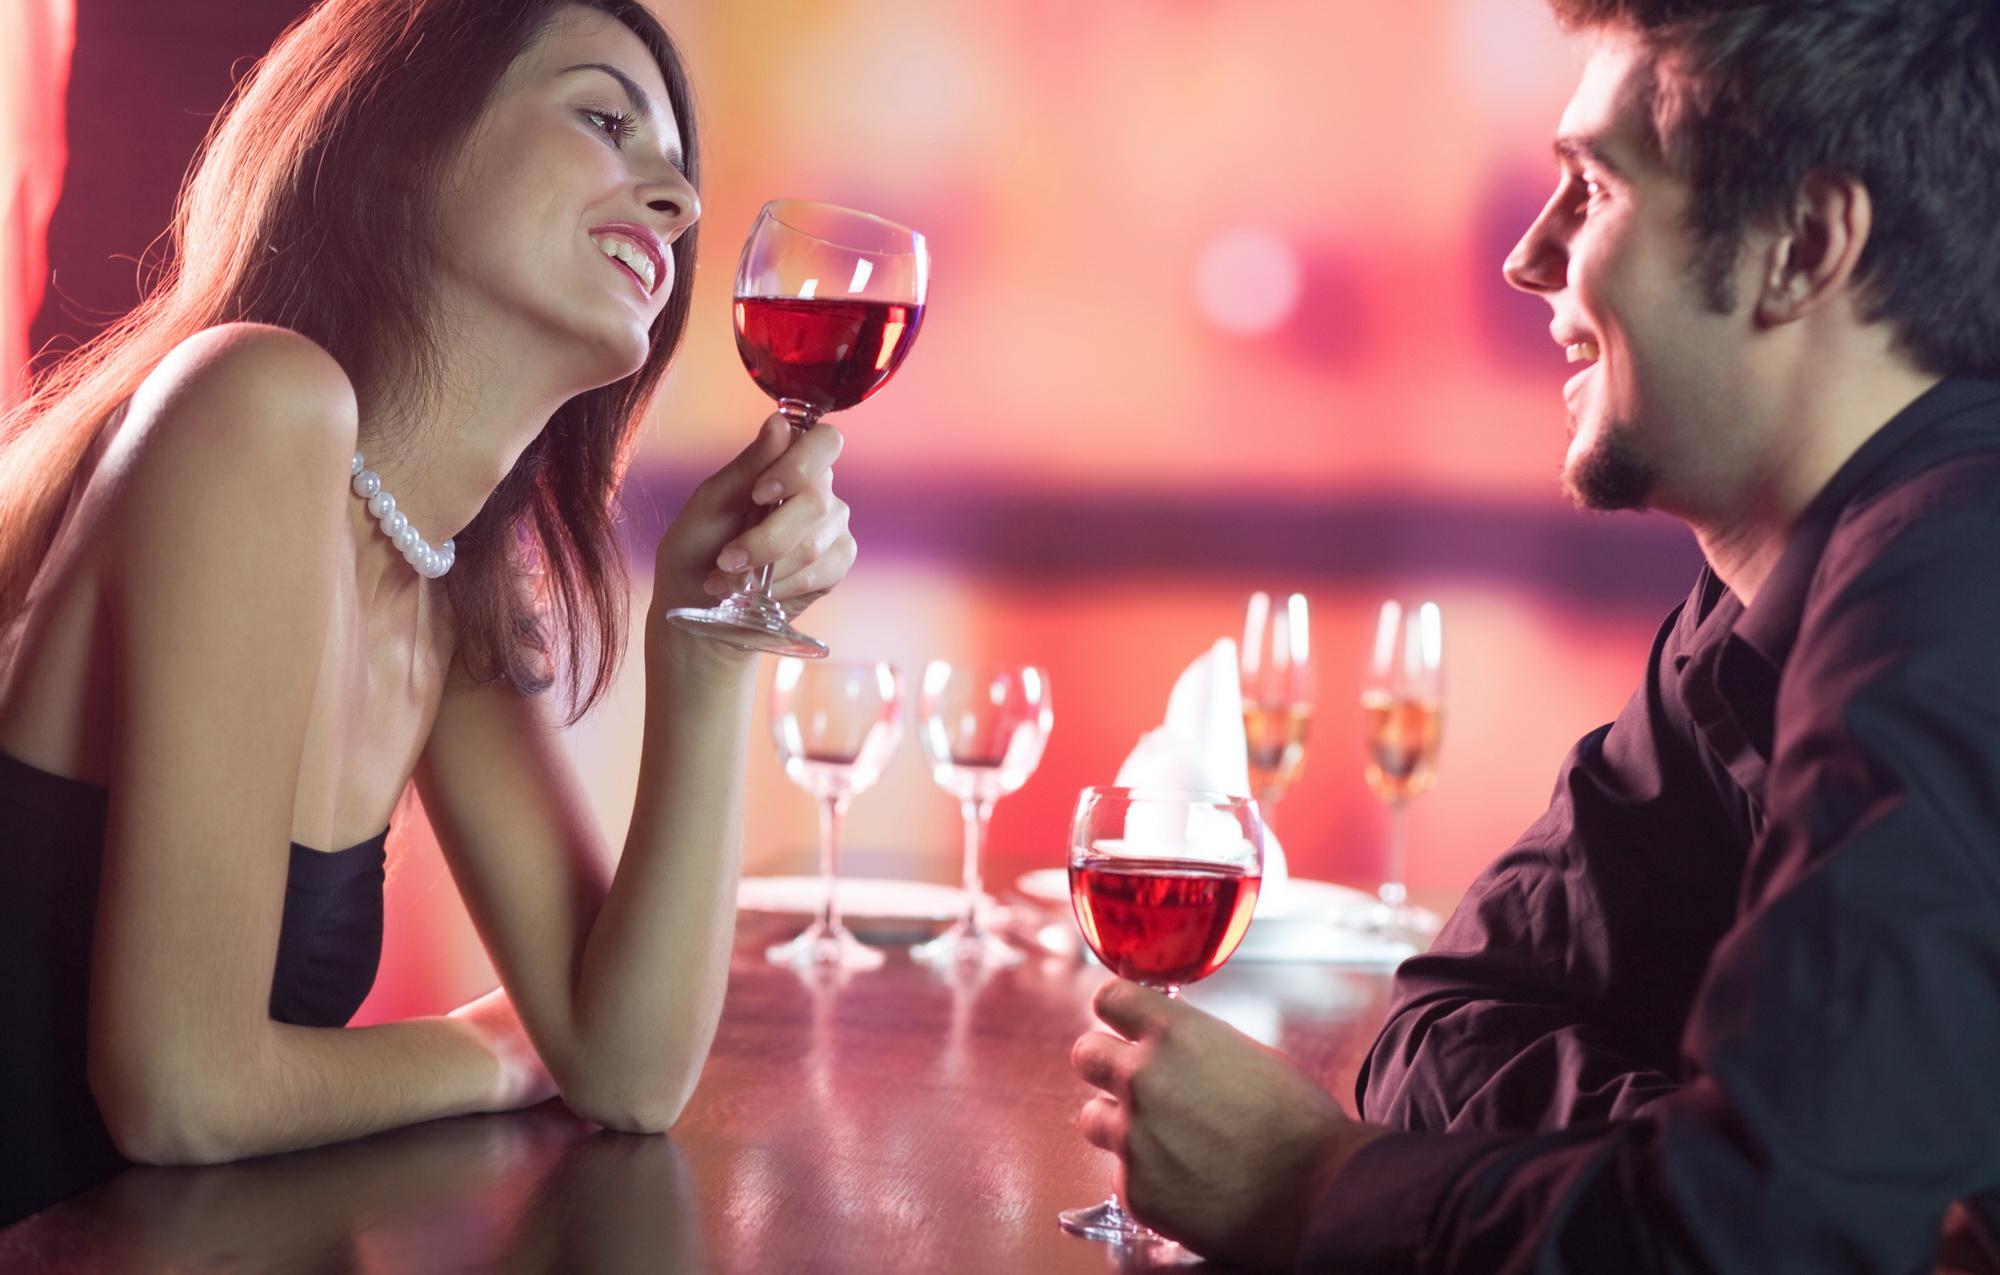 Dating marketing definition